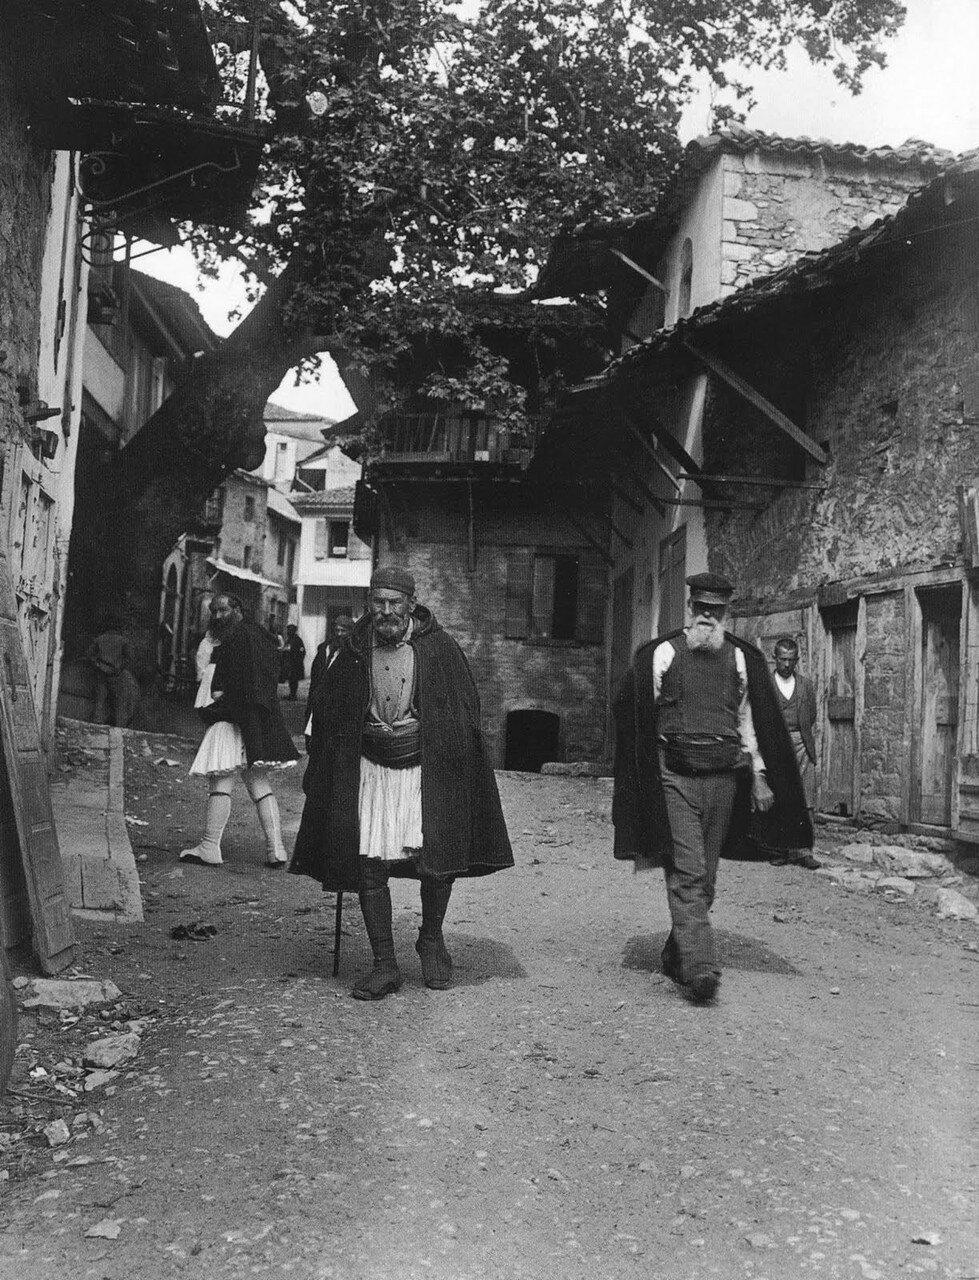 1903. Андрицена. Уличная сцена